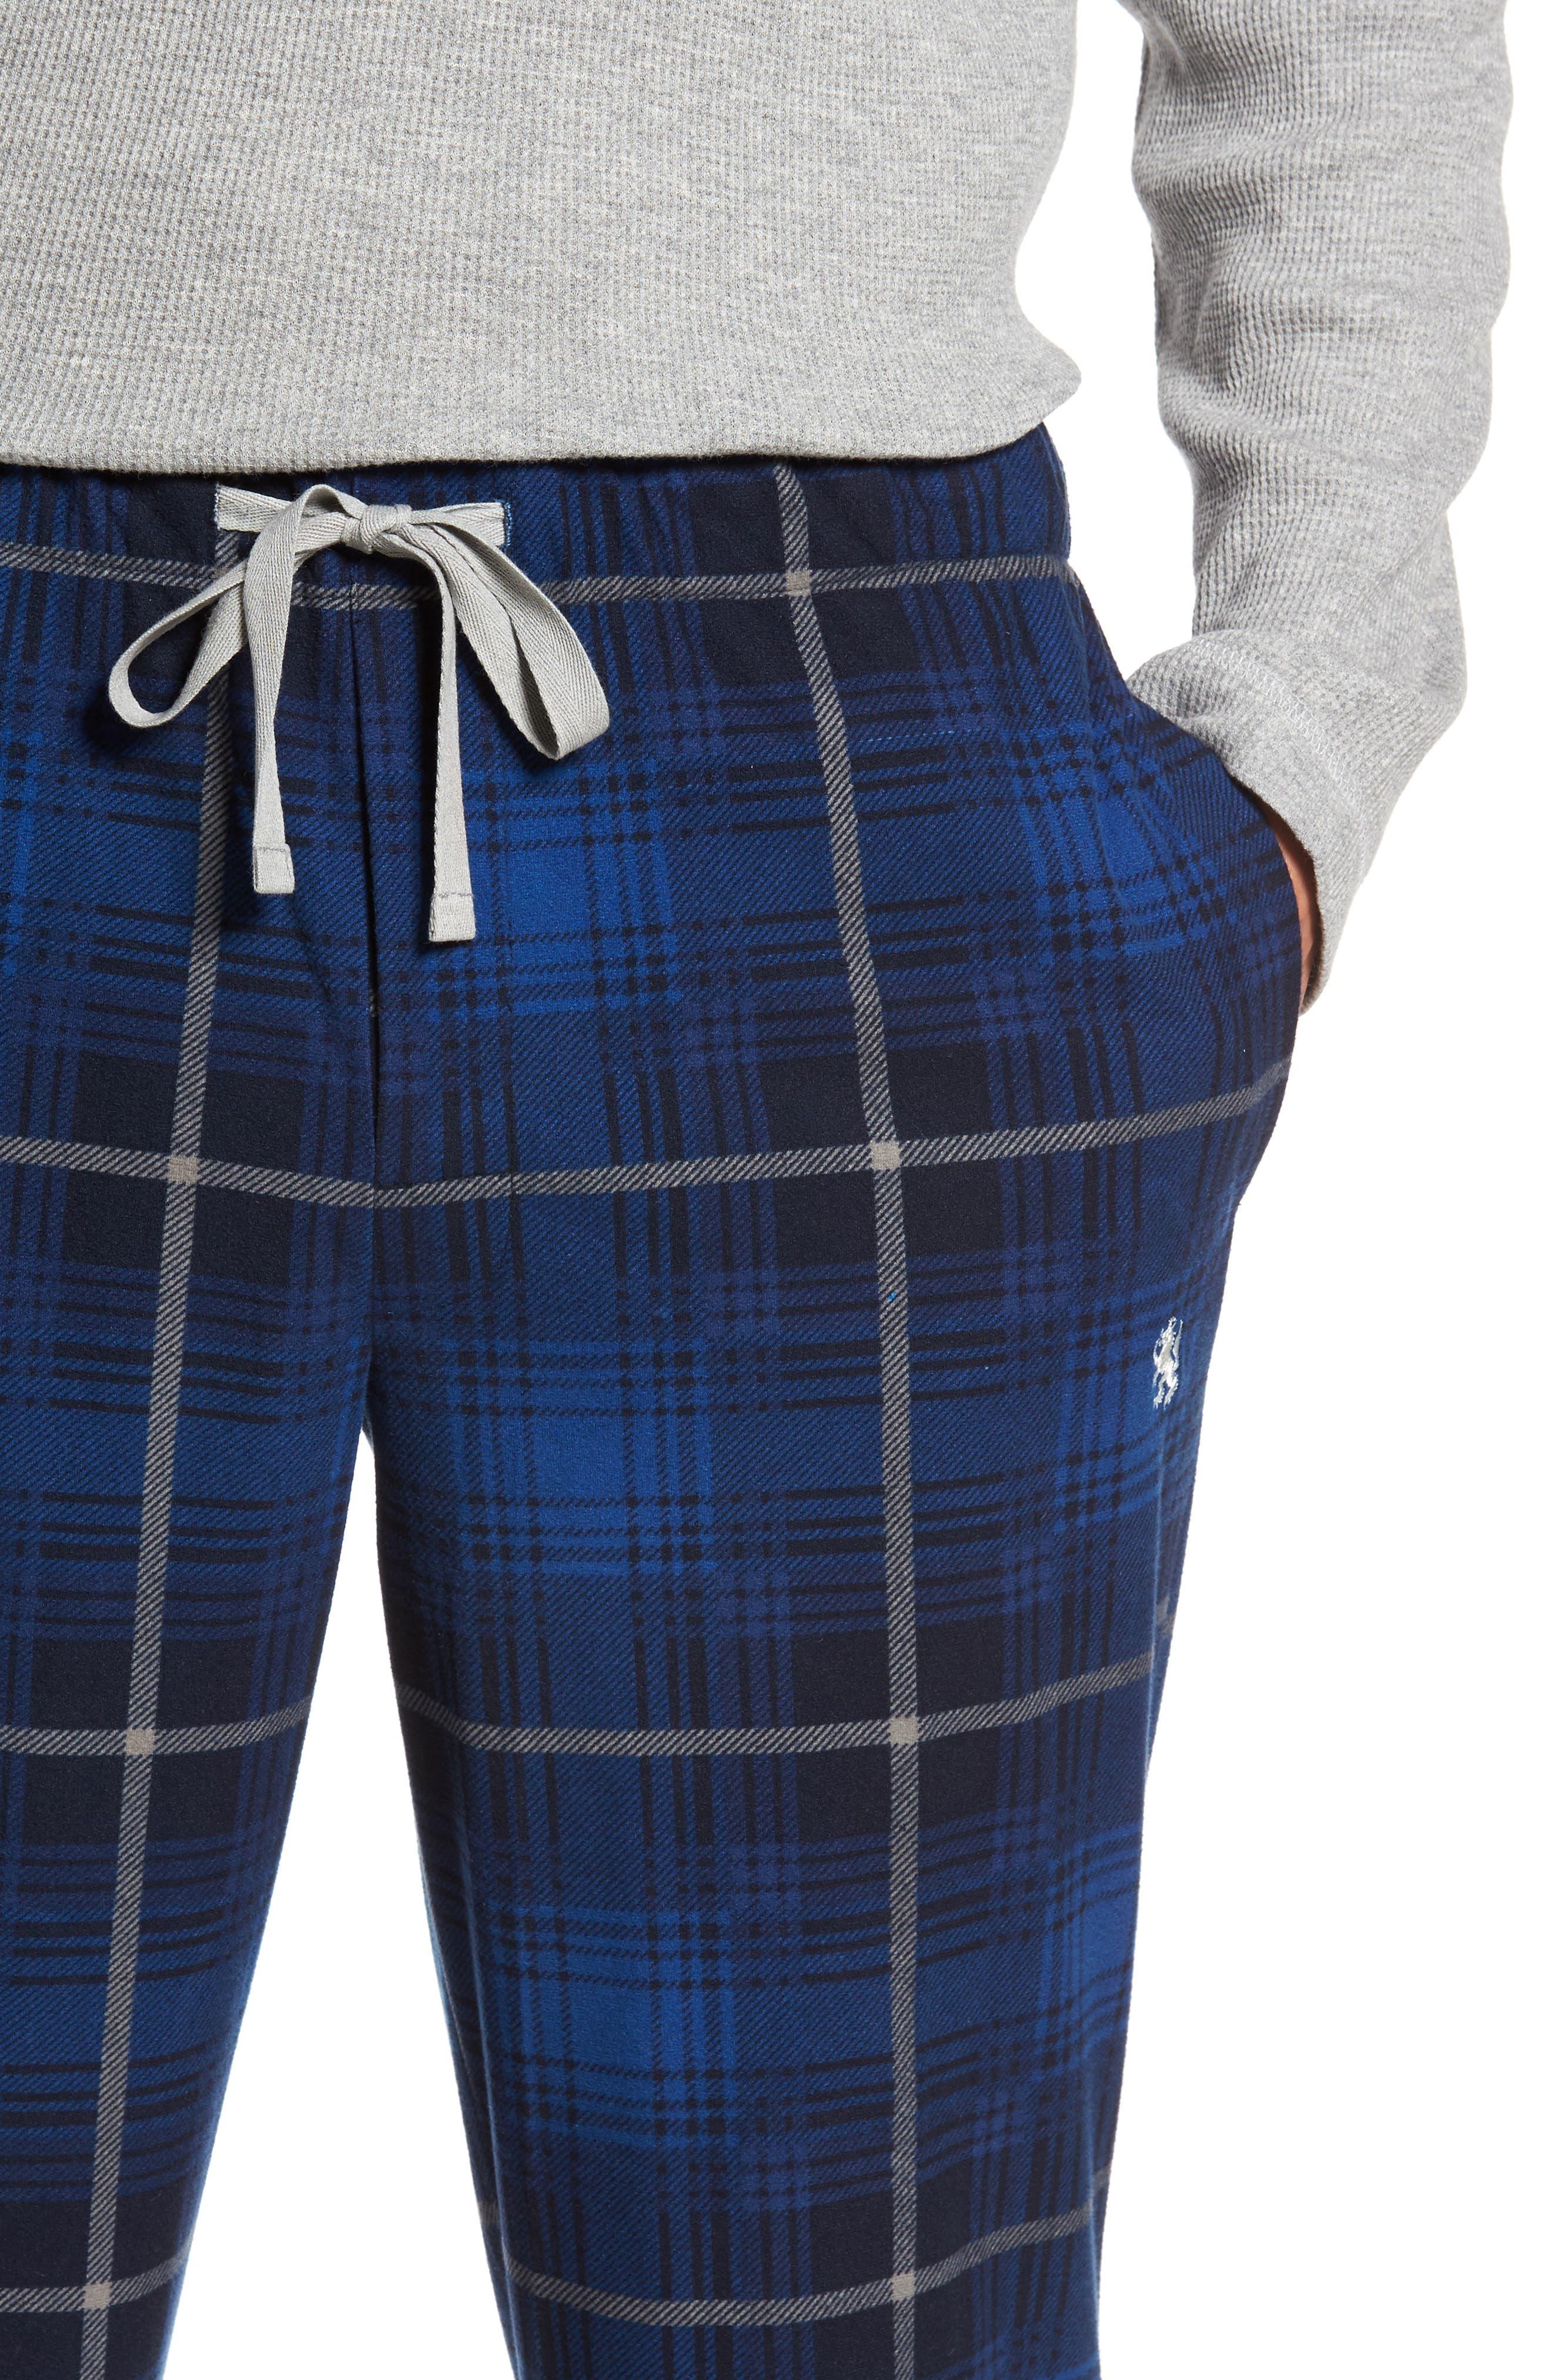 Alternate Image 4  - Majestic International Nifty Gift Henley Shirt & Lounge Pants